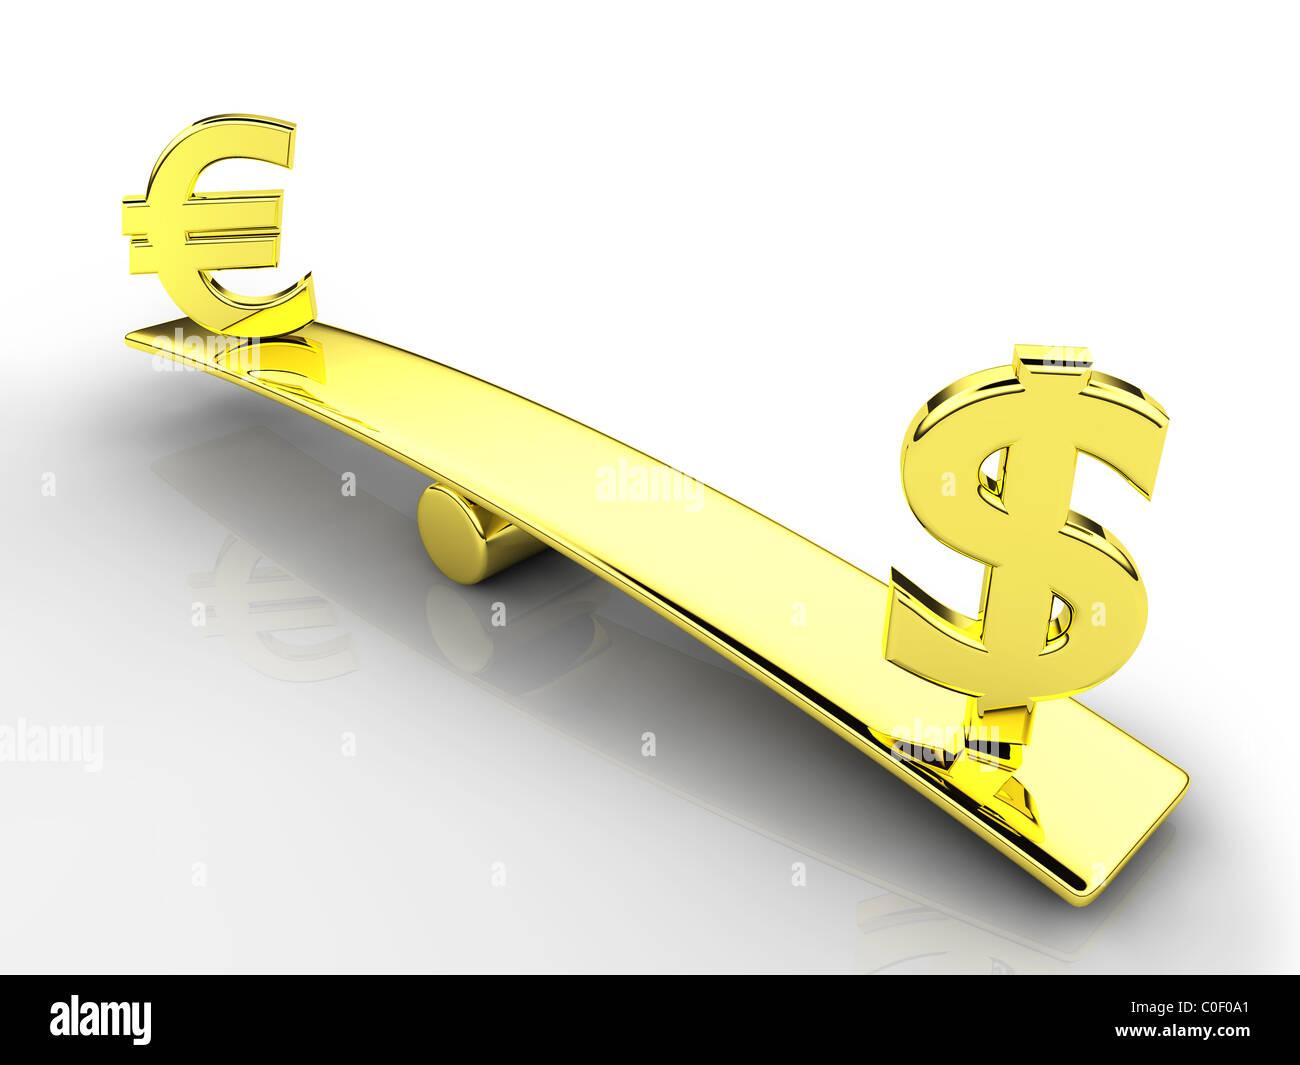 3d dollaro ed euro i simboli su una bilancia Immagini Stock